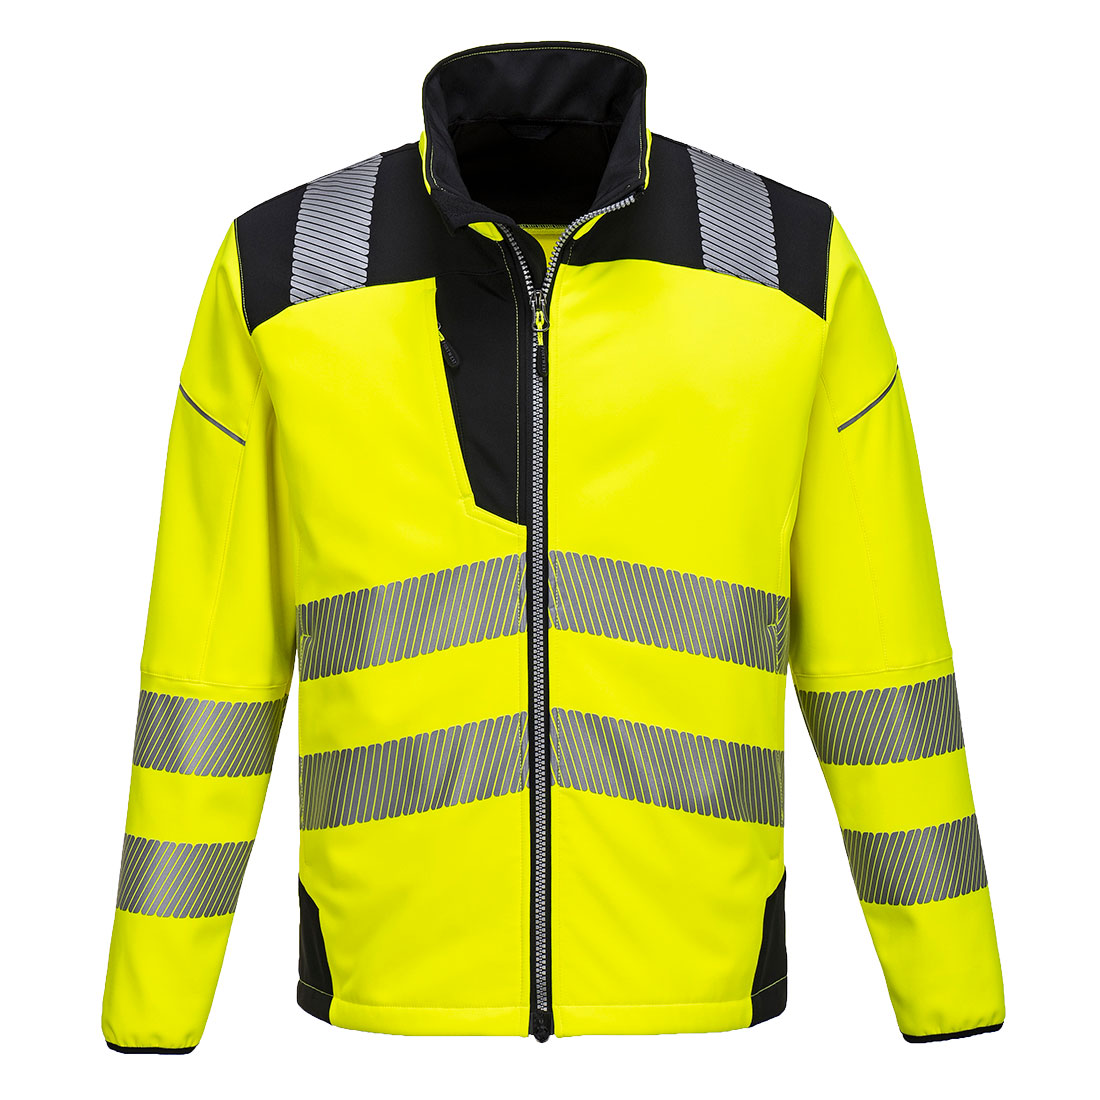 Safety at Work Portwest dzseki, kabát